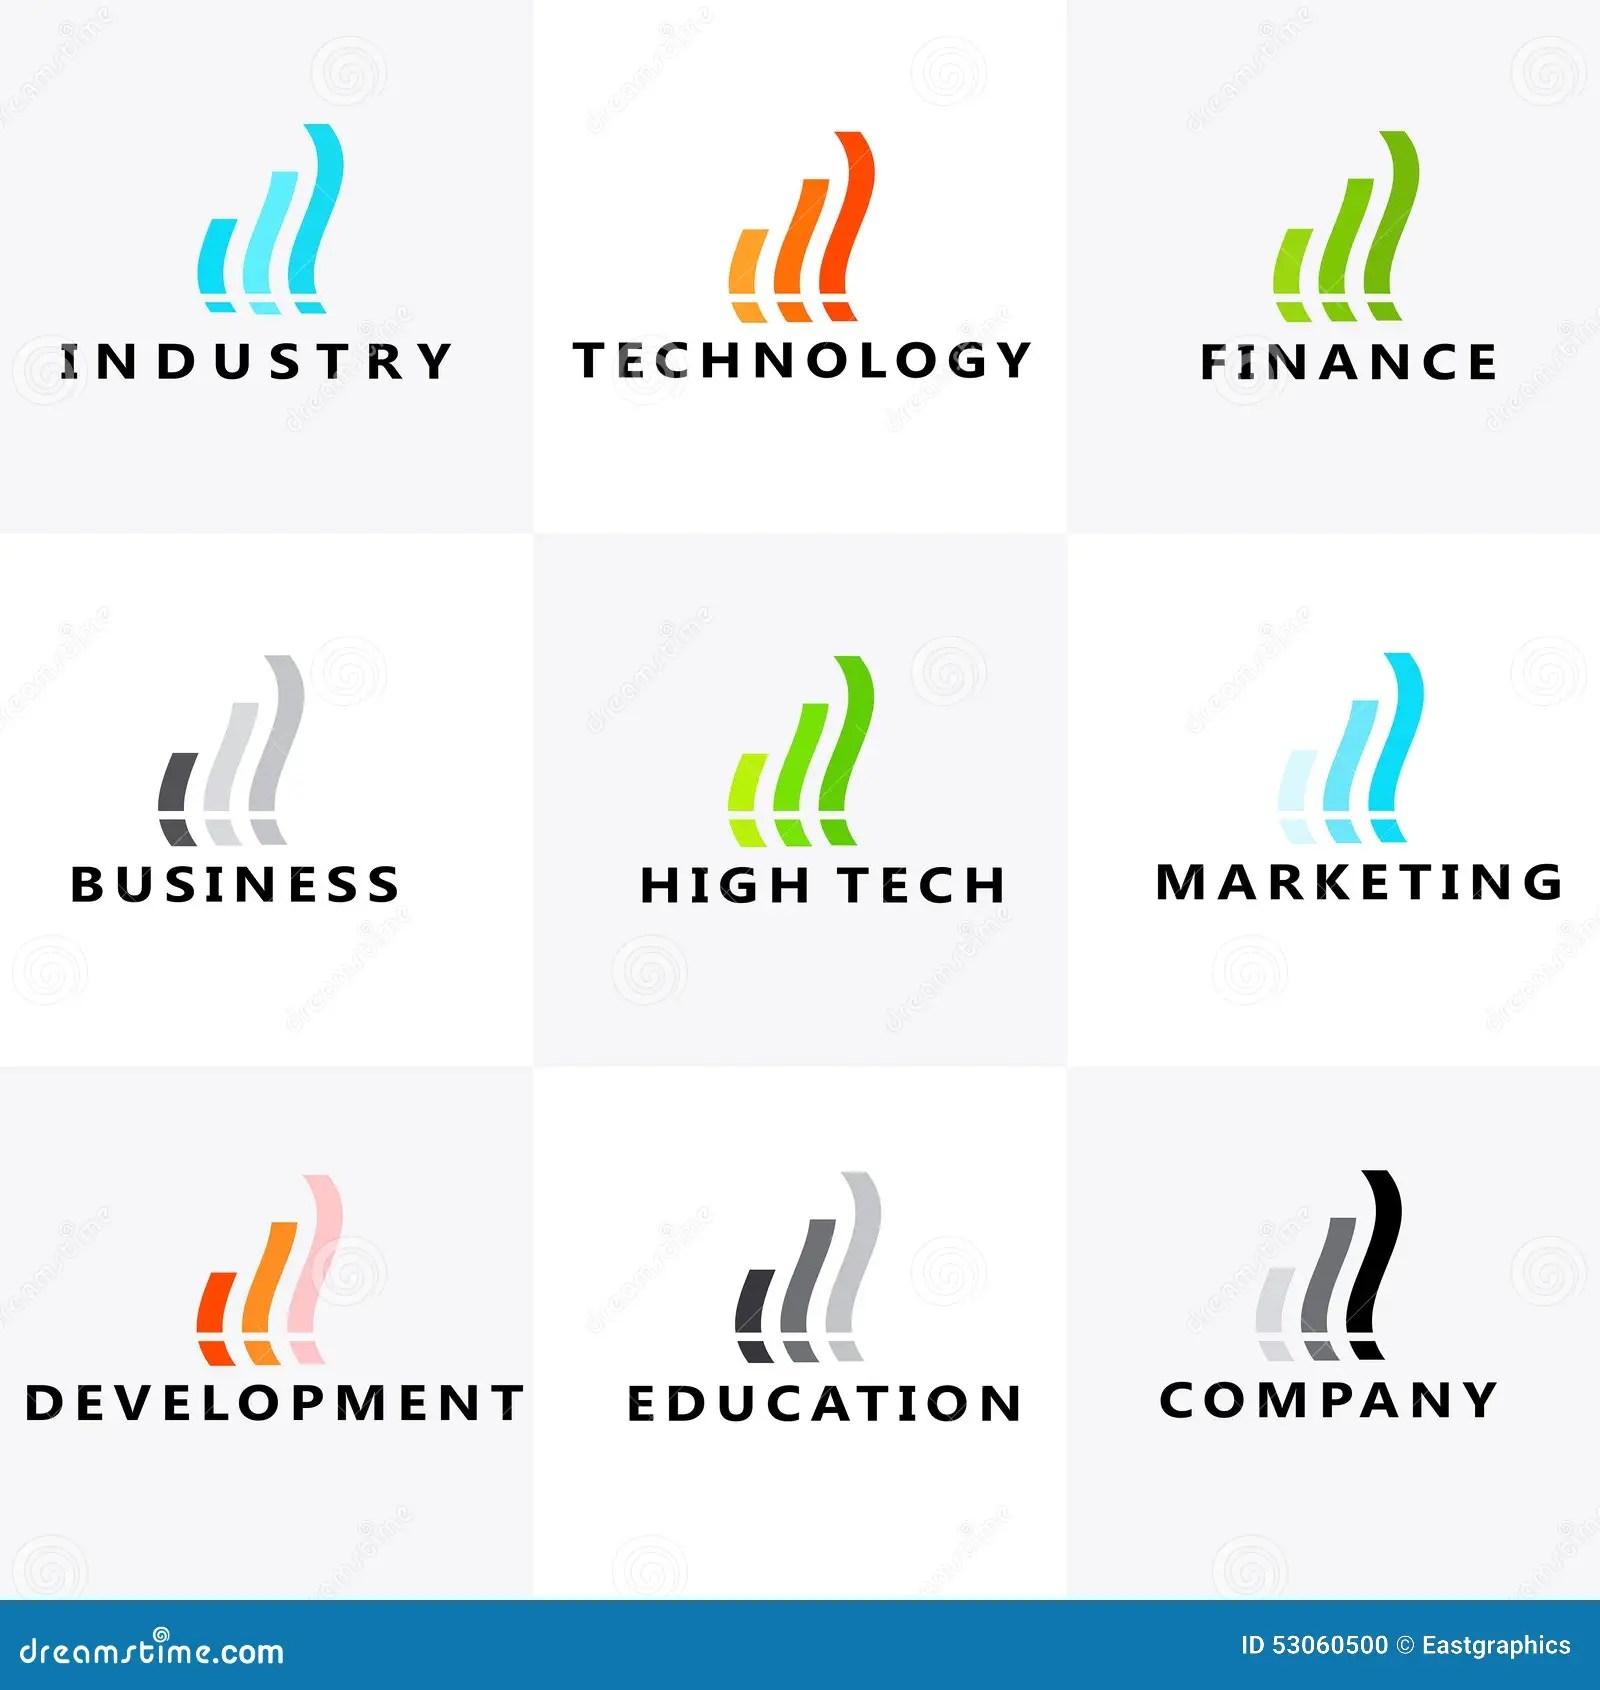 Development, Education, Communication, Marketing, High